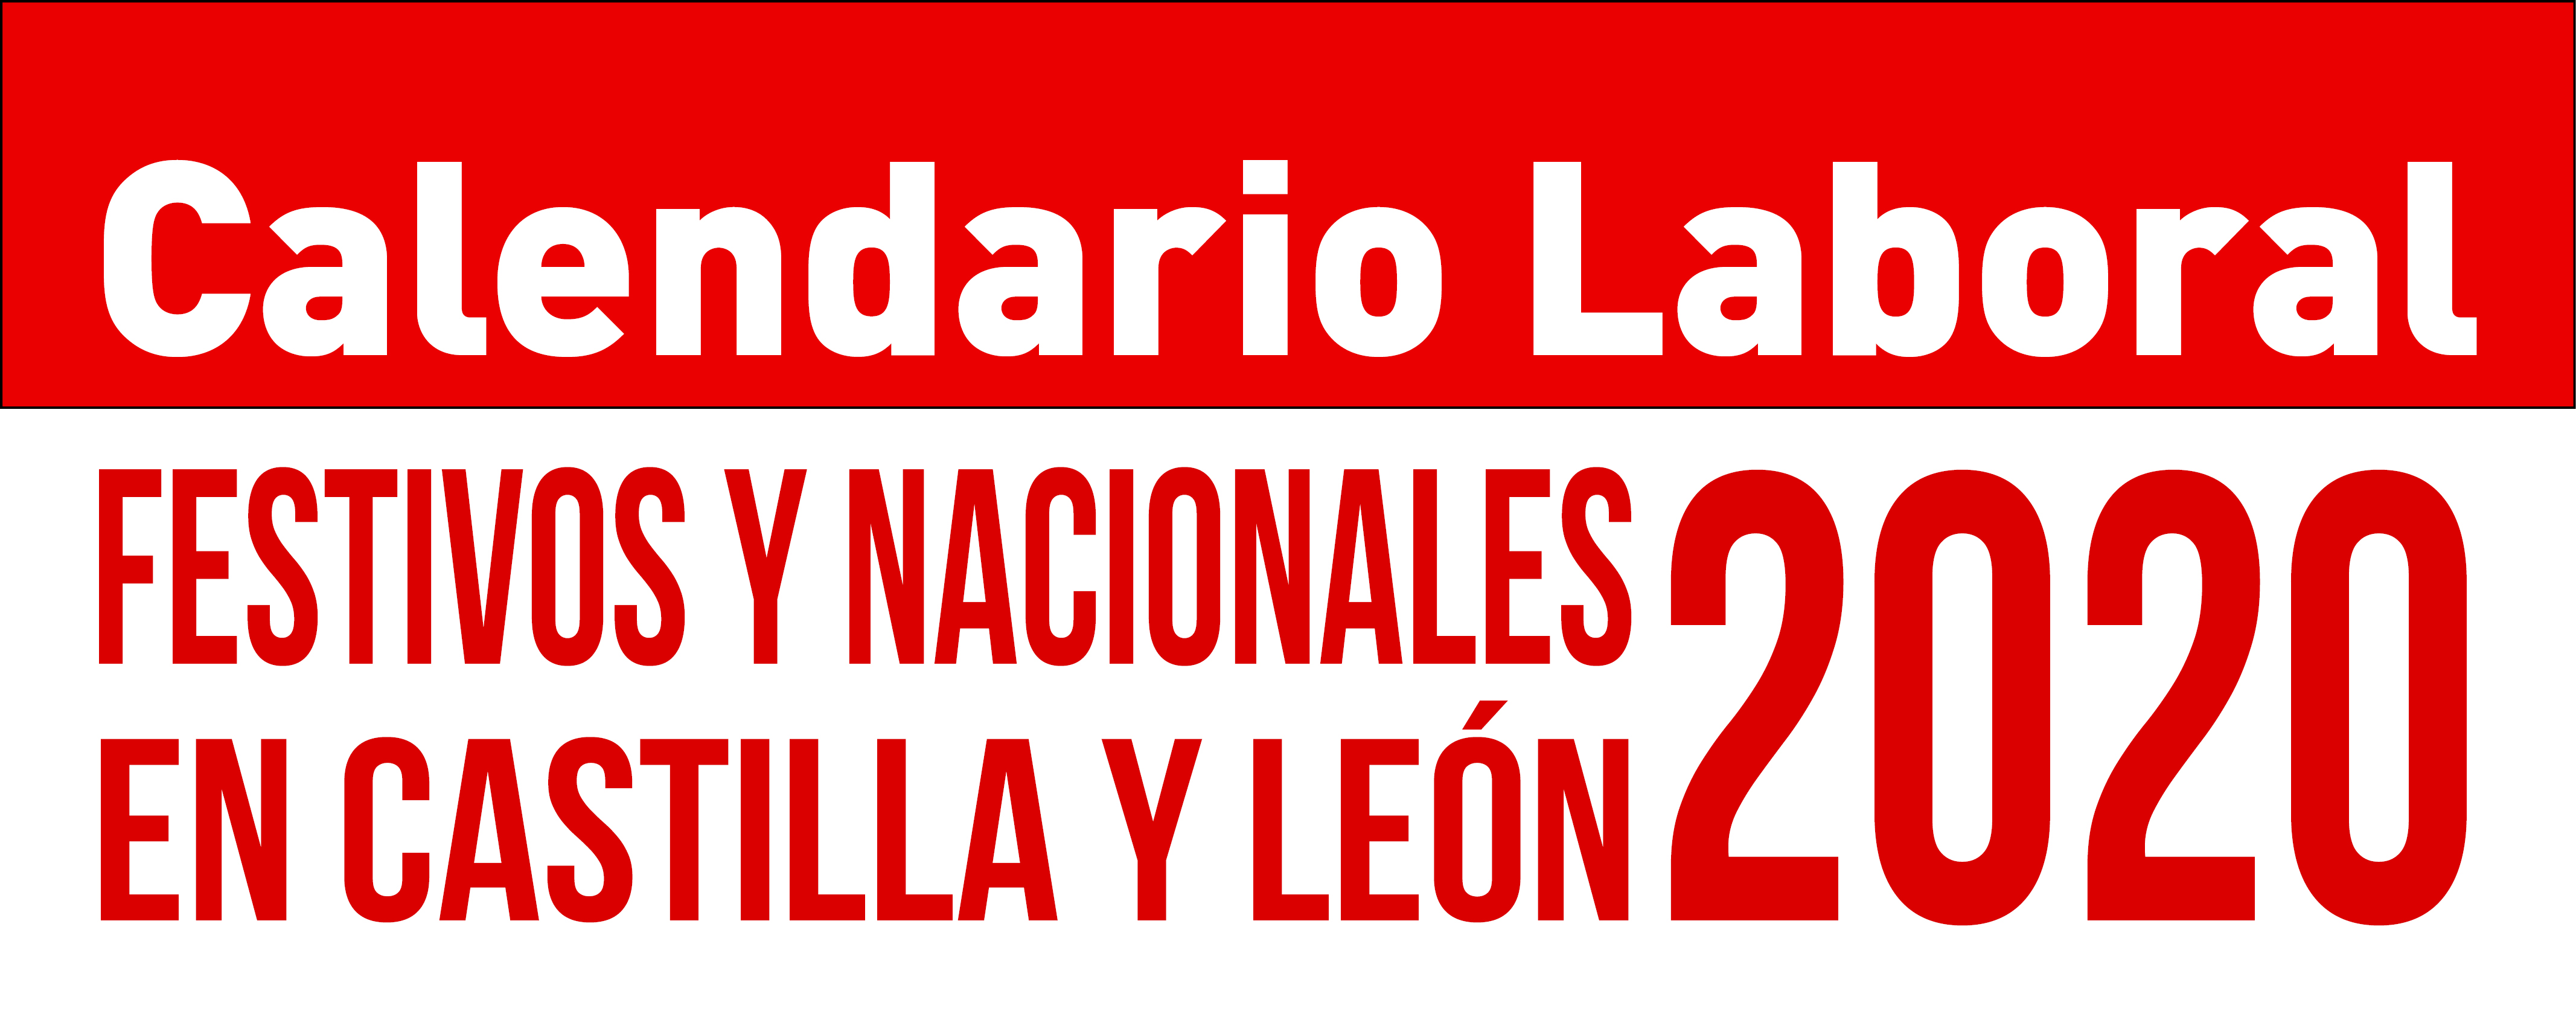 Calendario Laboral CyL 2020